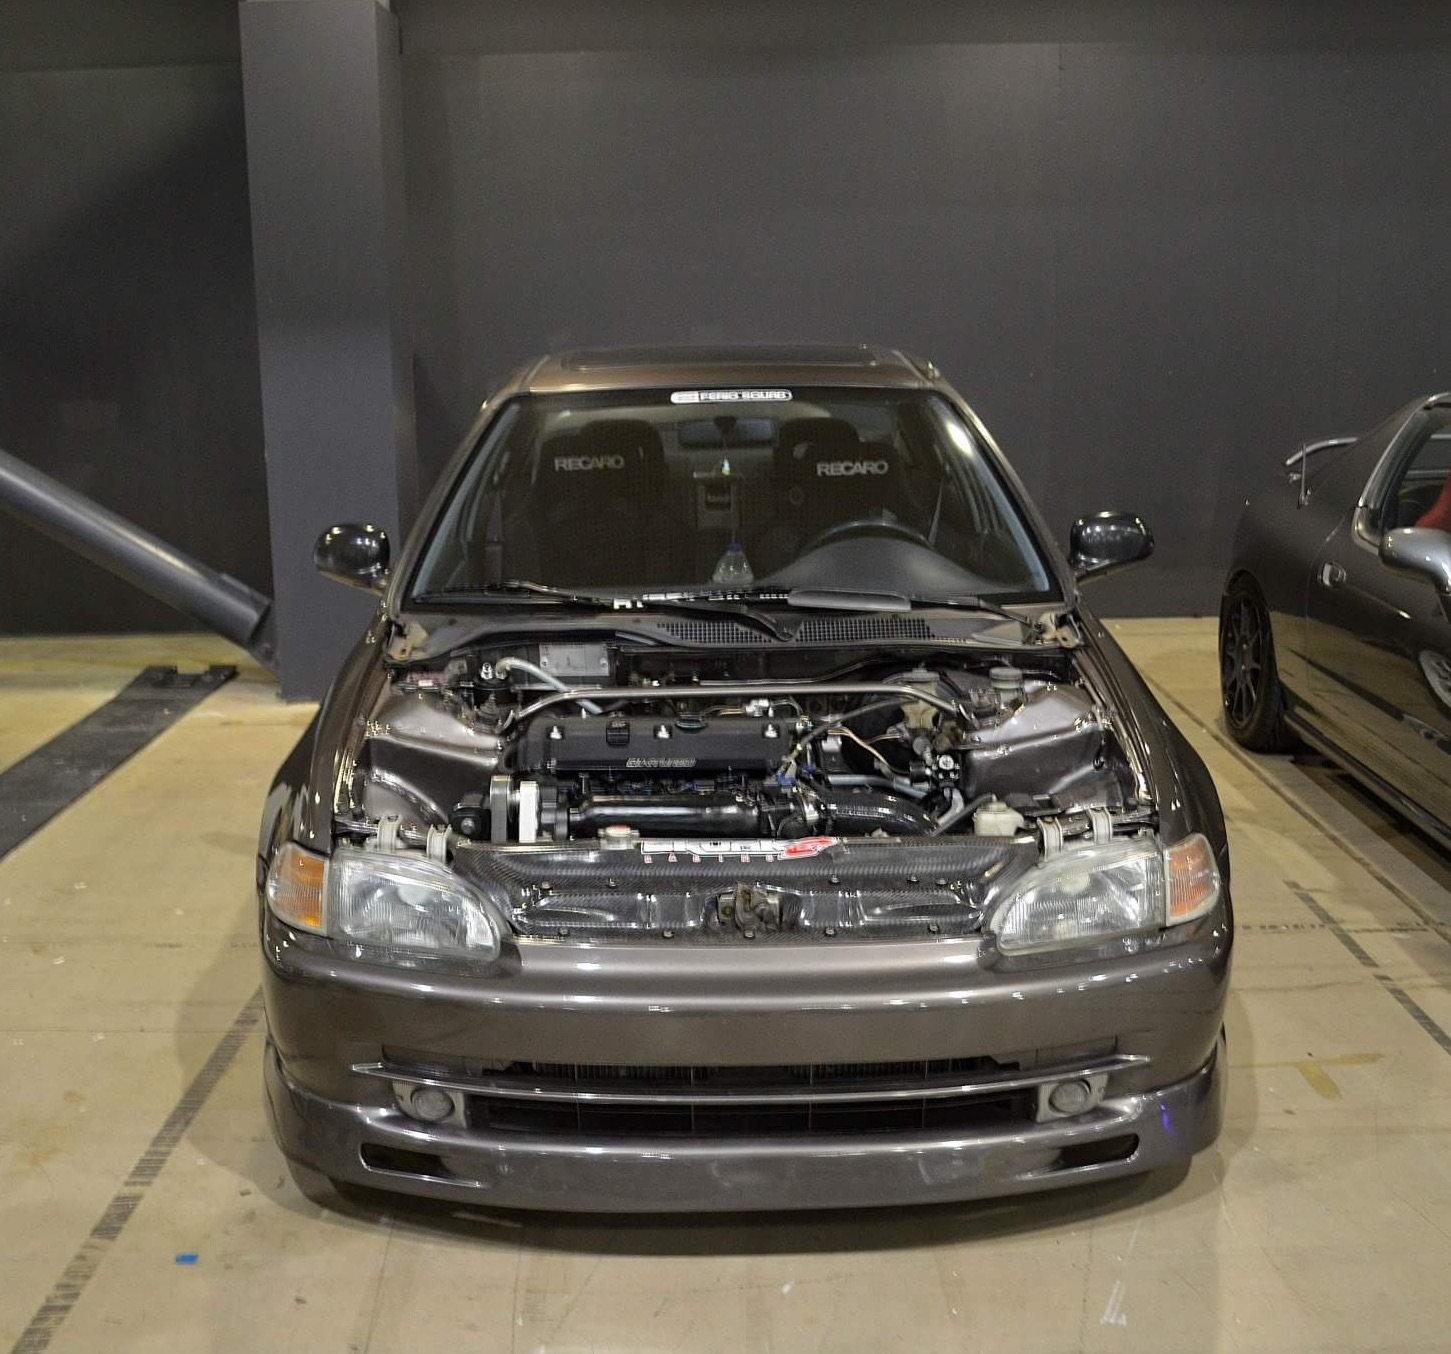 The Eg Ferio Squad New Improved Honda Tech Forum 1991 Crx Wiring Diagram Http Hondatechcom Showthreadphpt 8 Be Intergradical